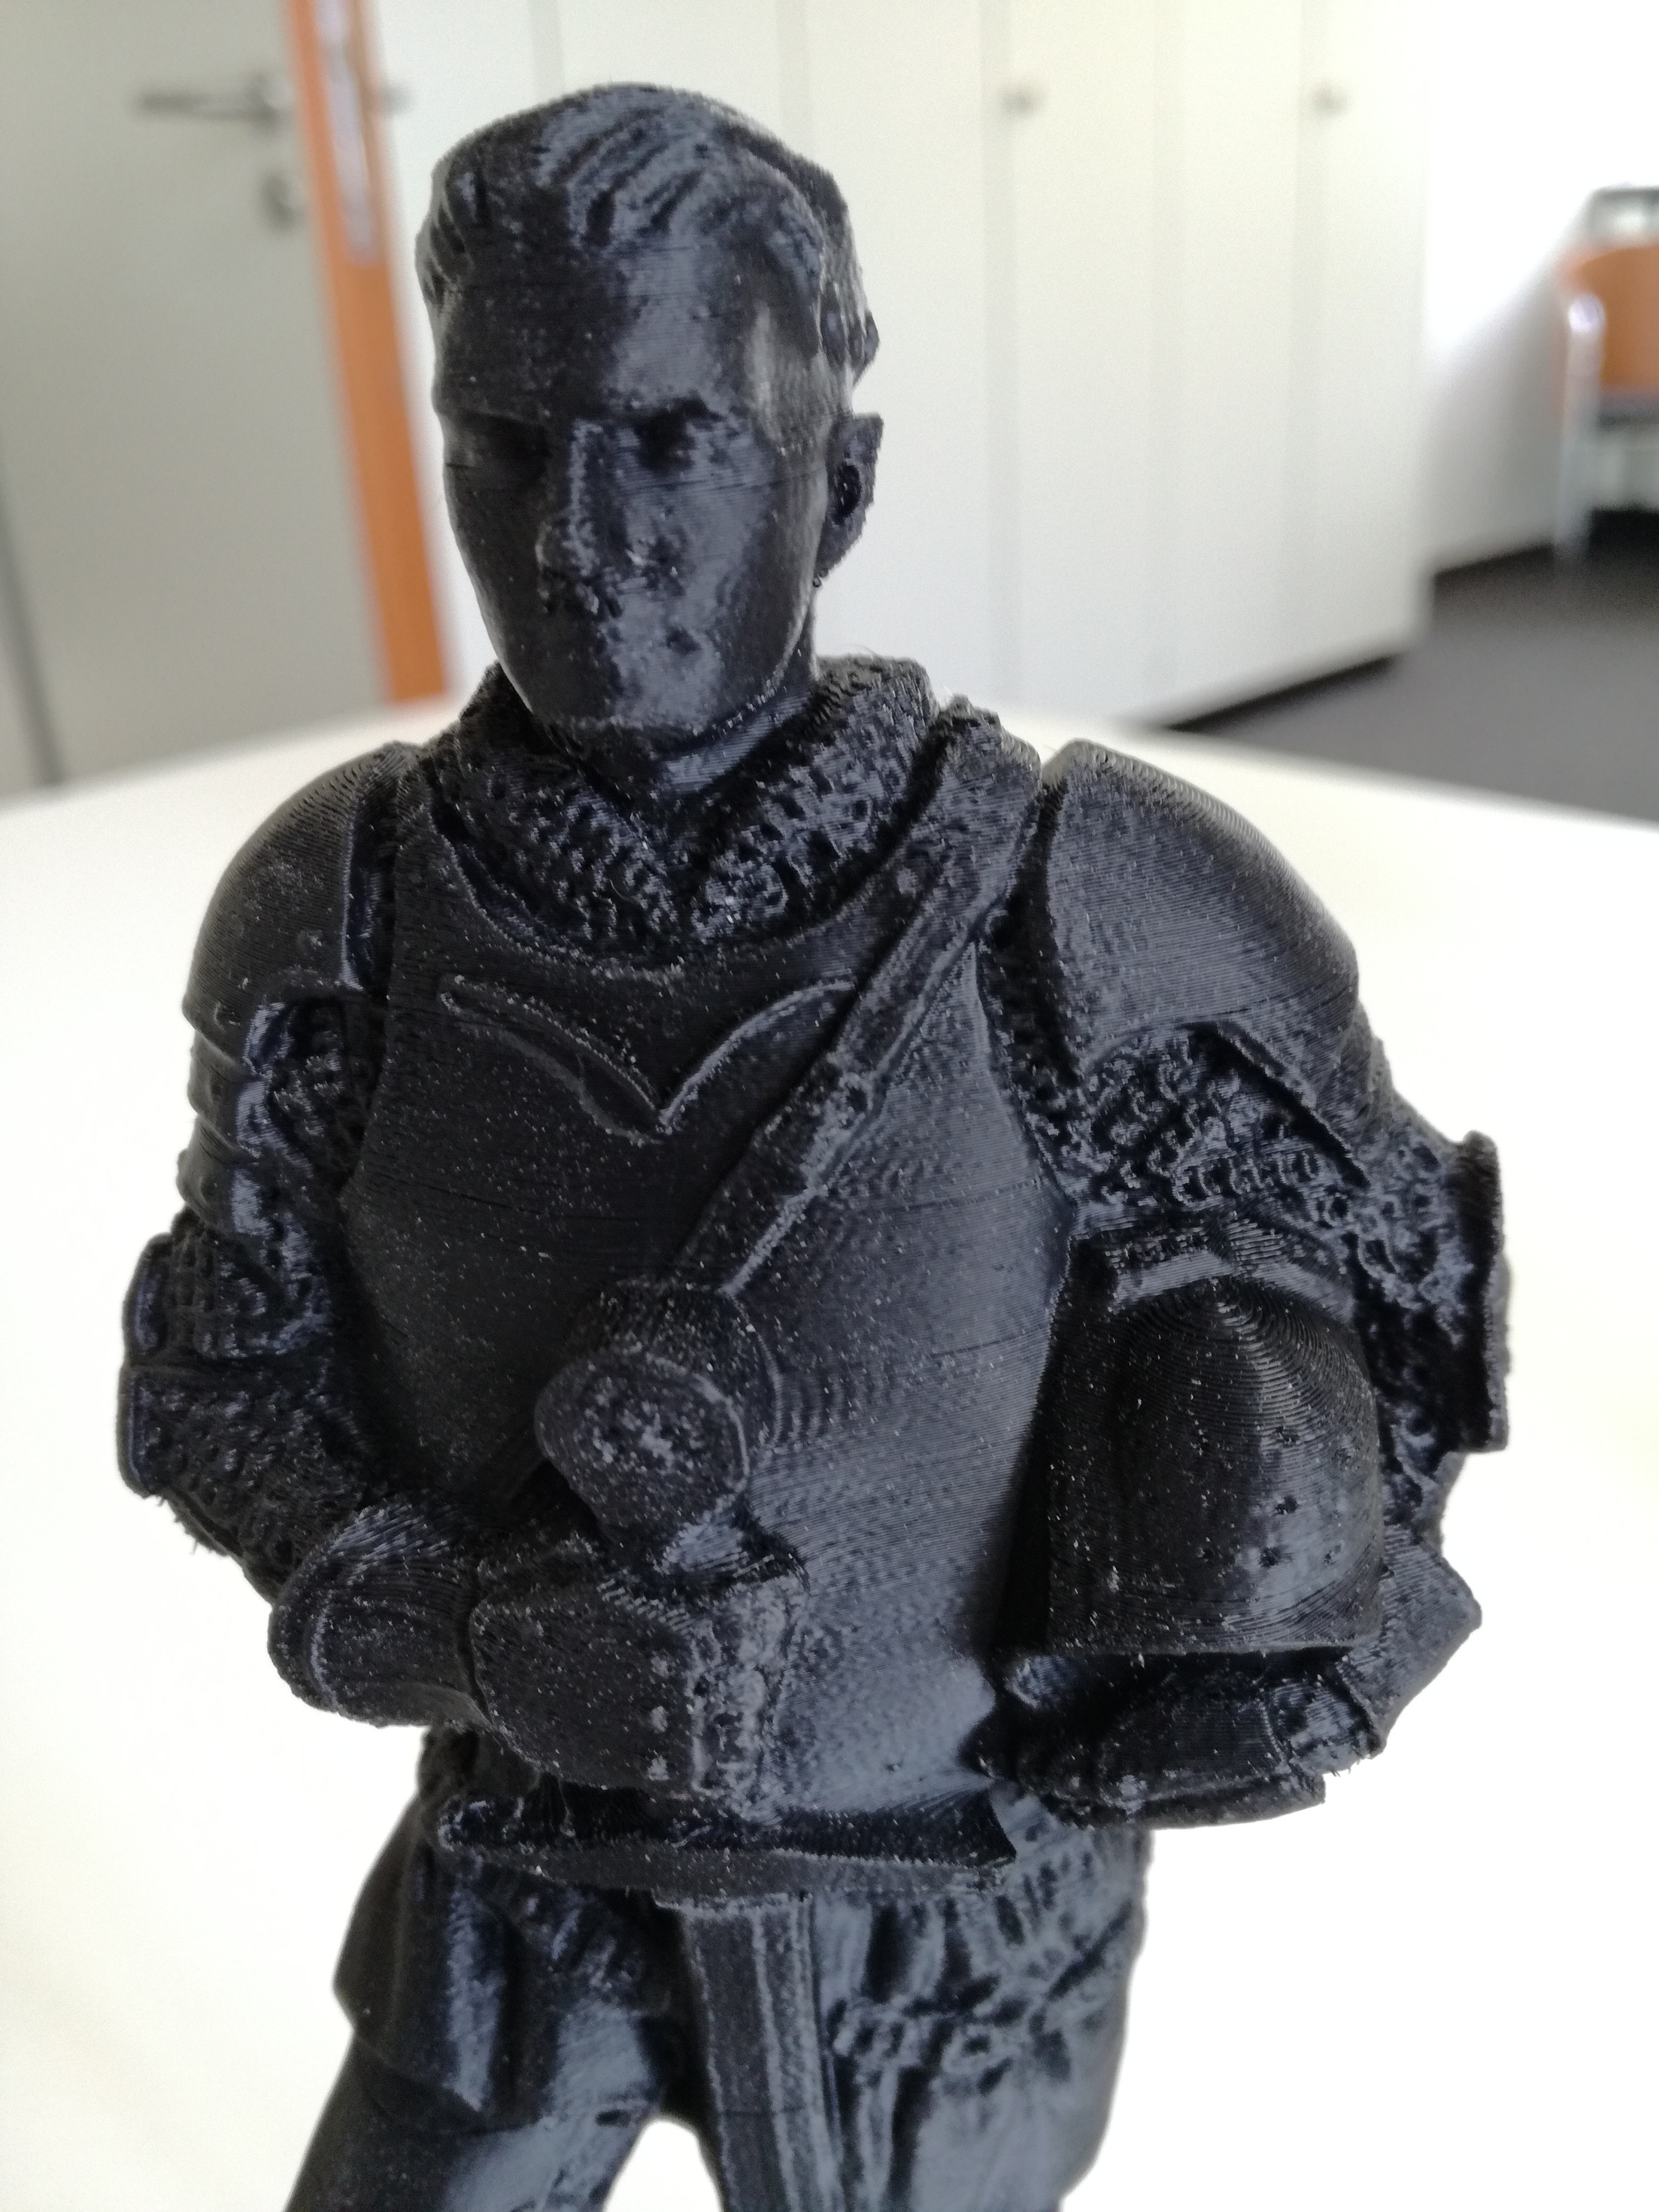 3D Print of the statue - Pledge/Kickstarter - Kingdom Come